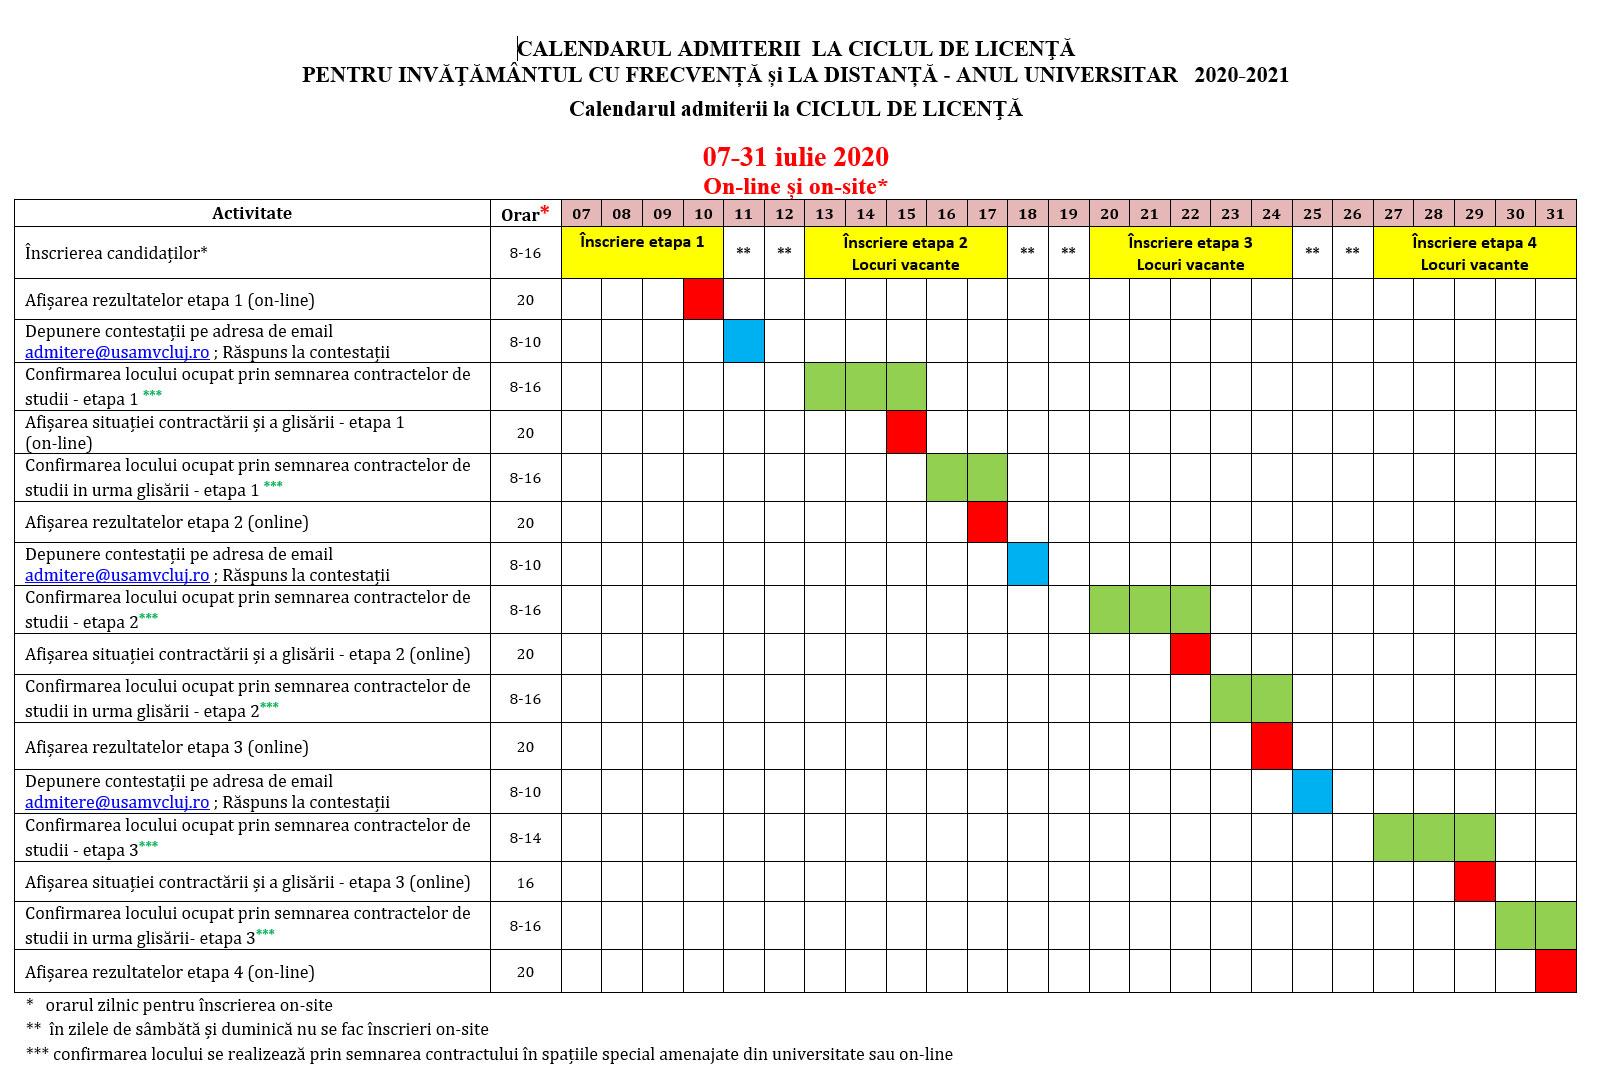 calendar-admitere licenta iulie 2020-1